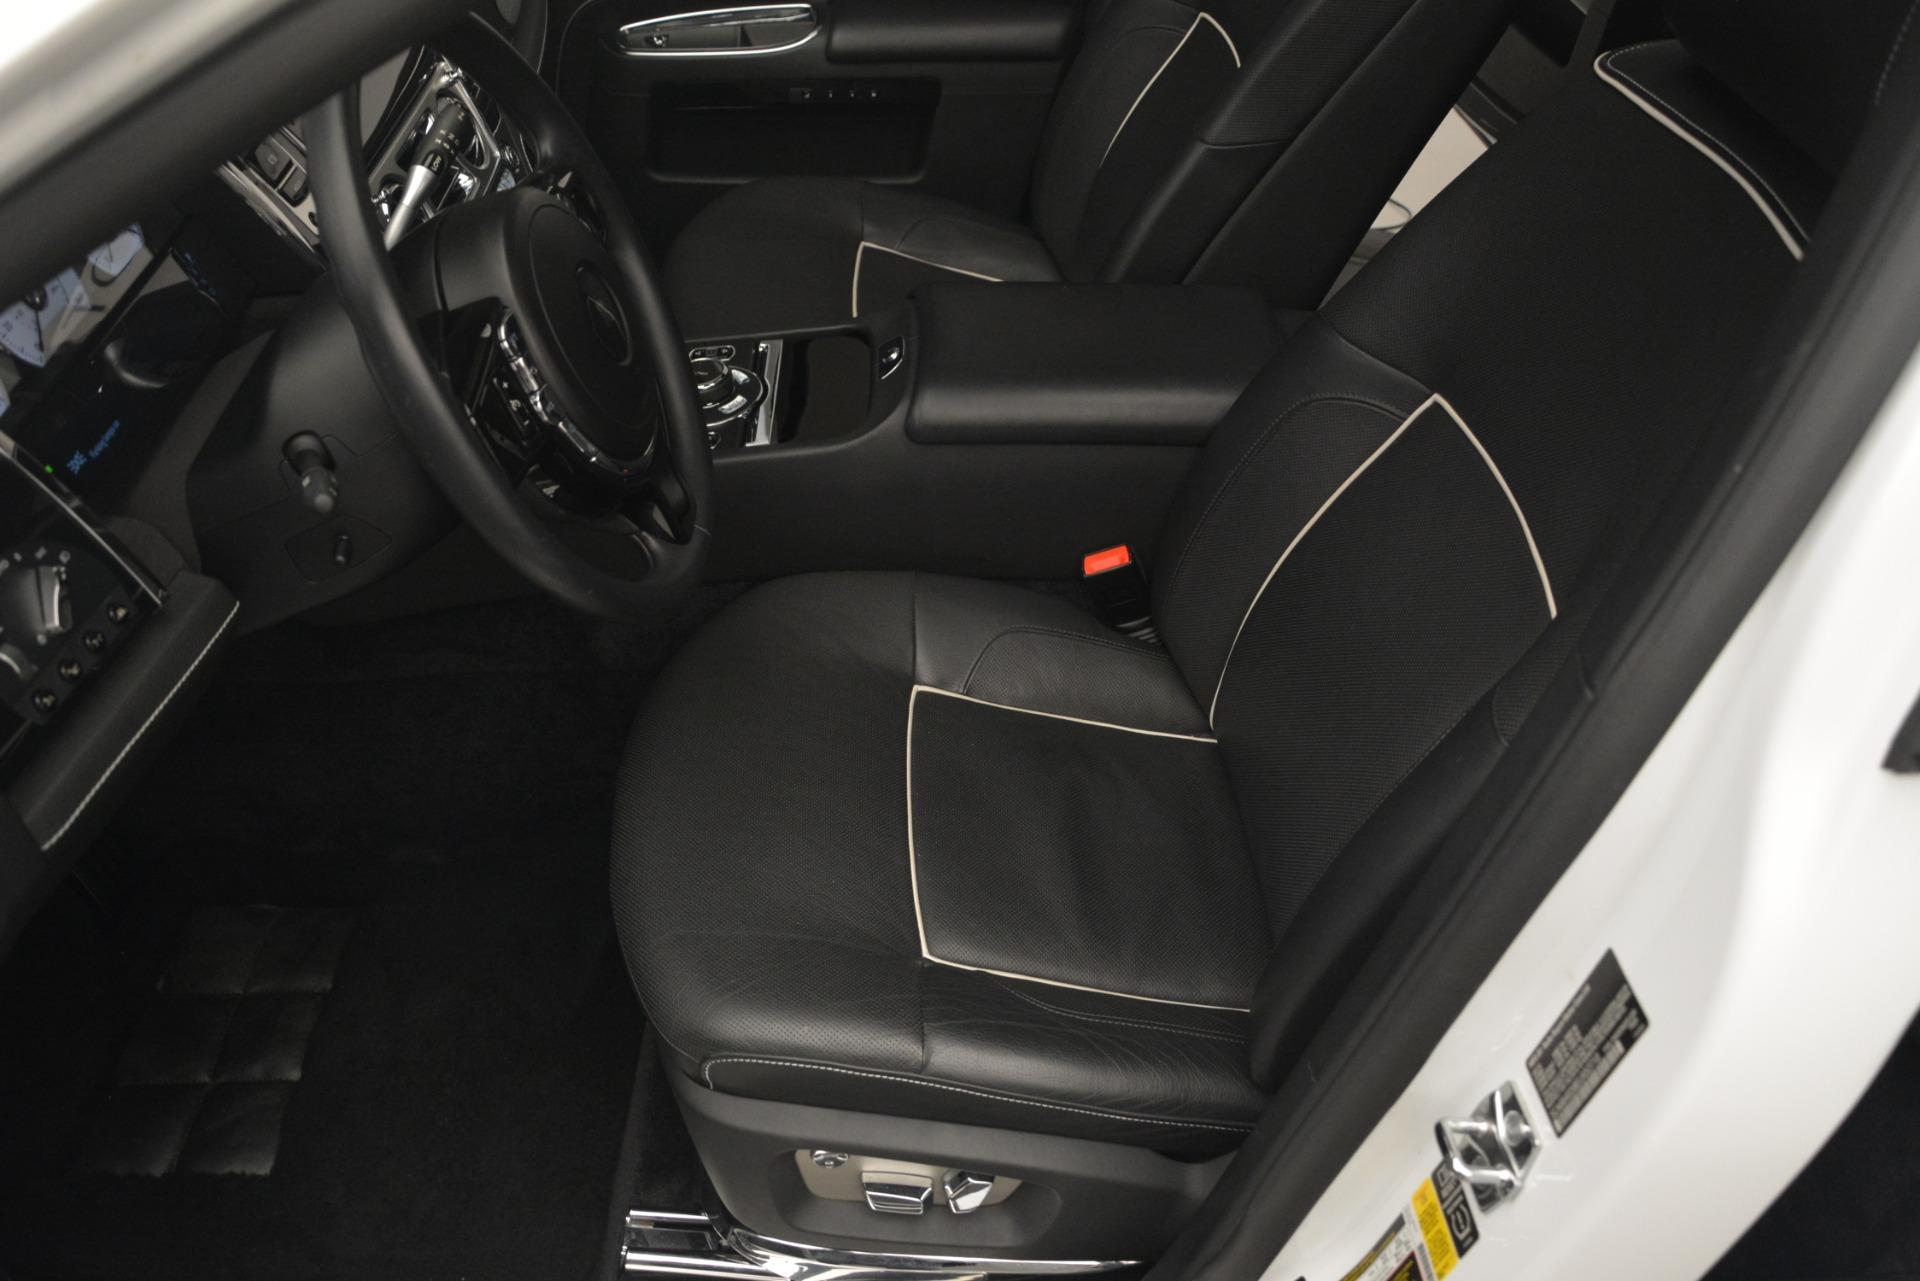 Used 2014 Rolls-Royce Ghost V-Spec For Sale In Westport, CT 2989_p16